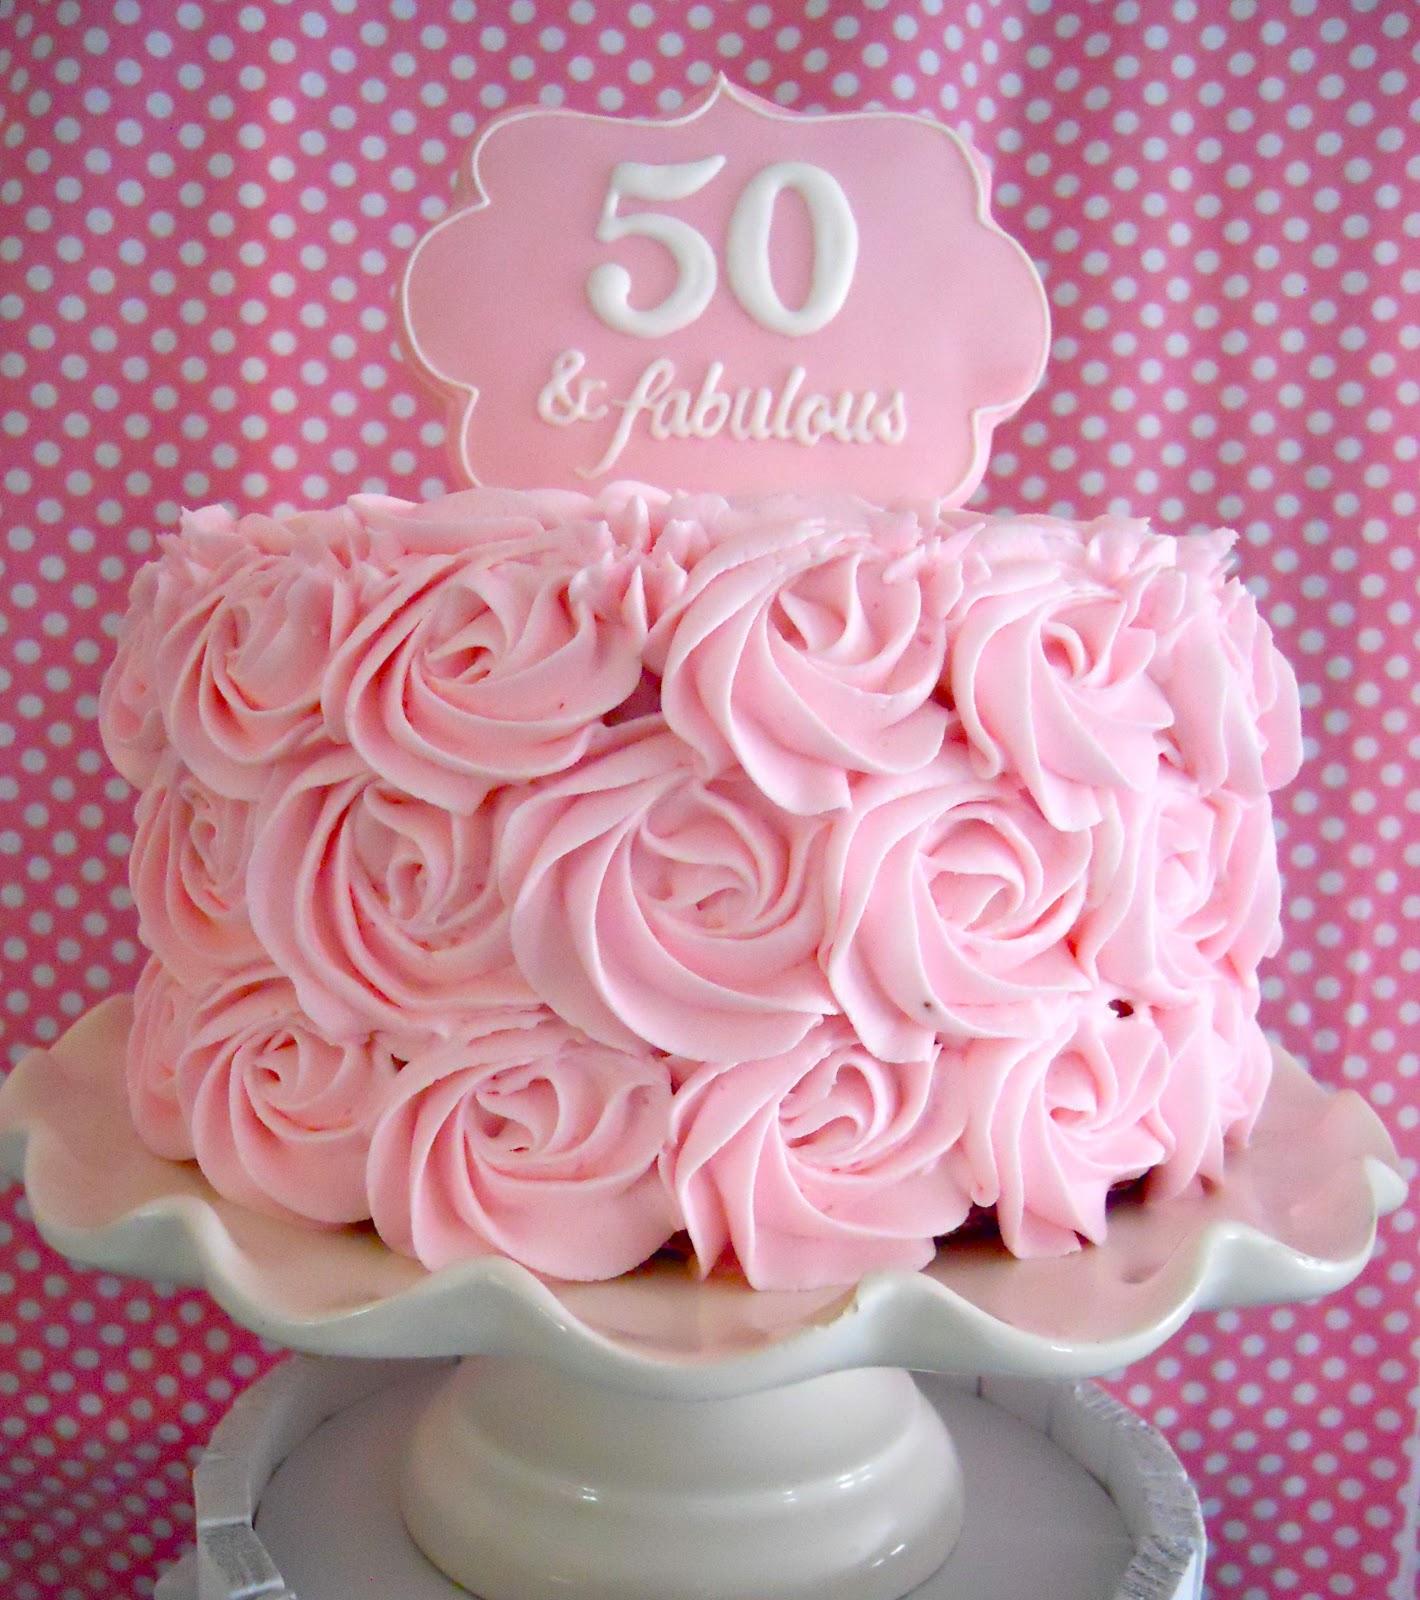 Fifty Birthday Cake Designs